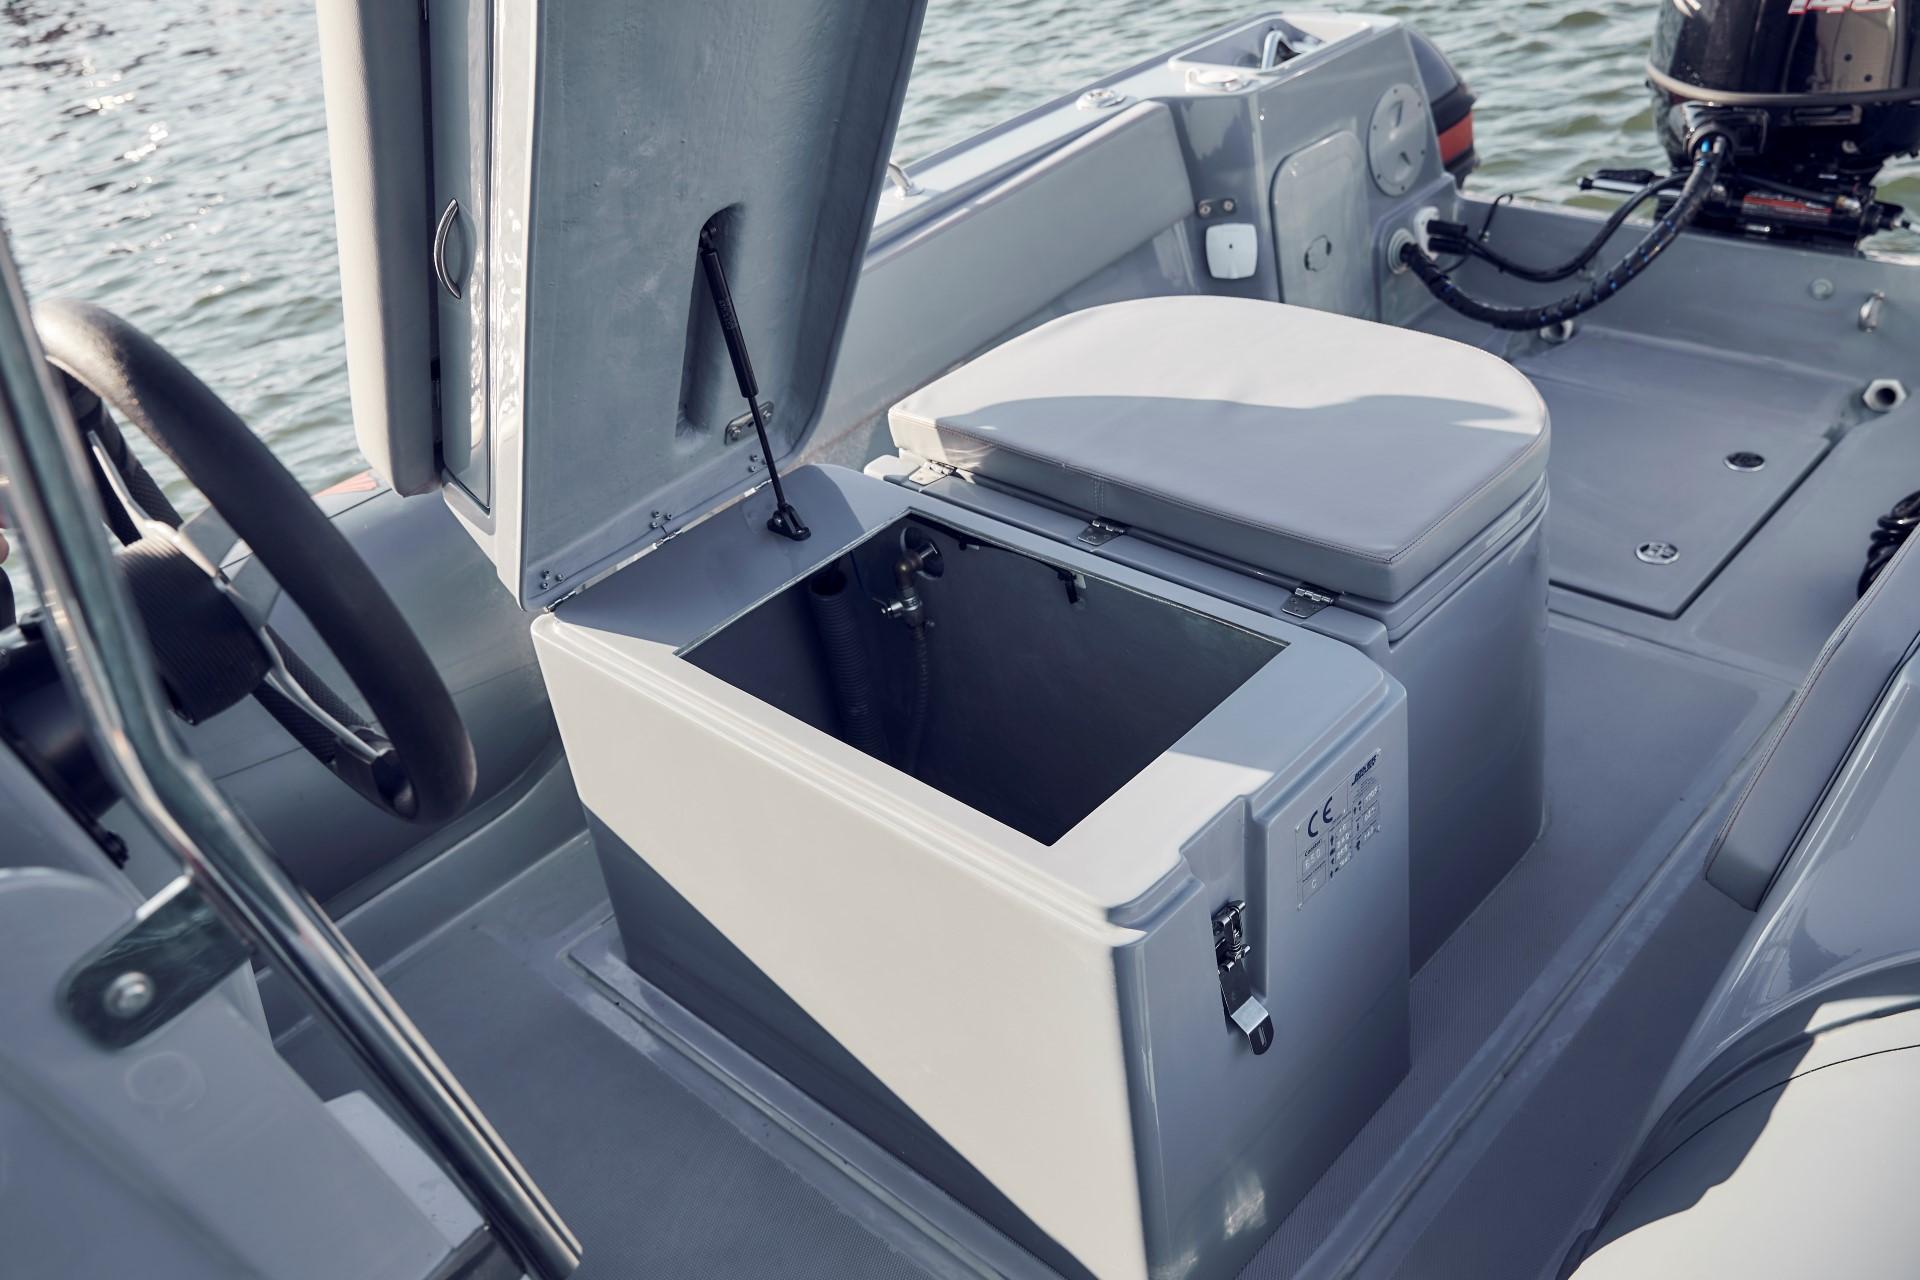 Joker Boat Barracuda storage under the seat